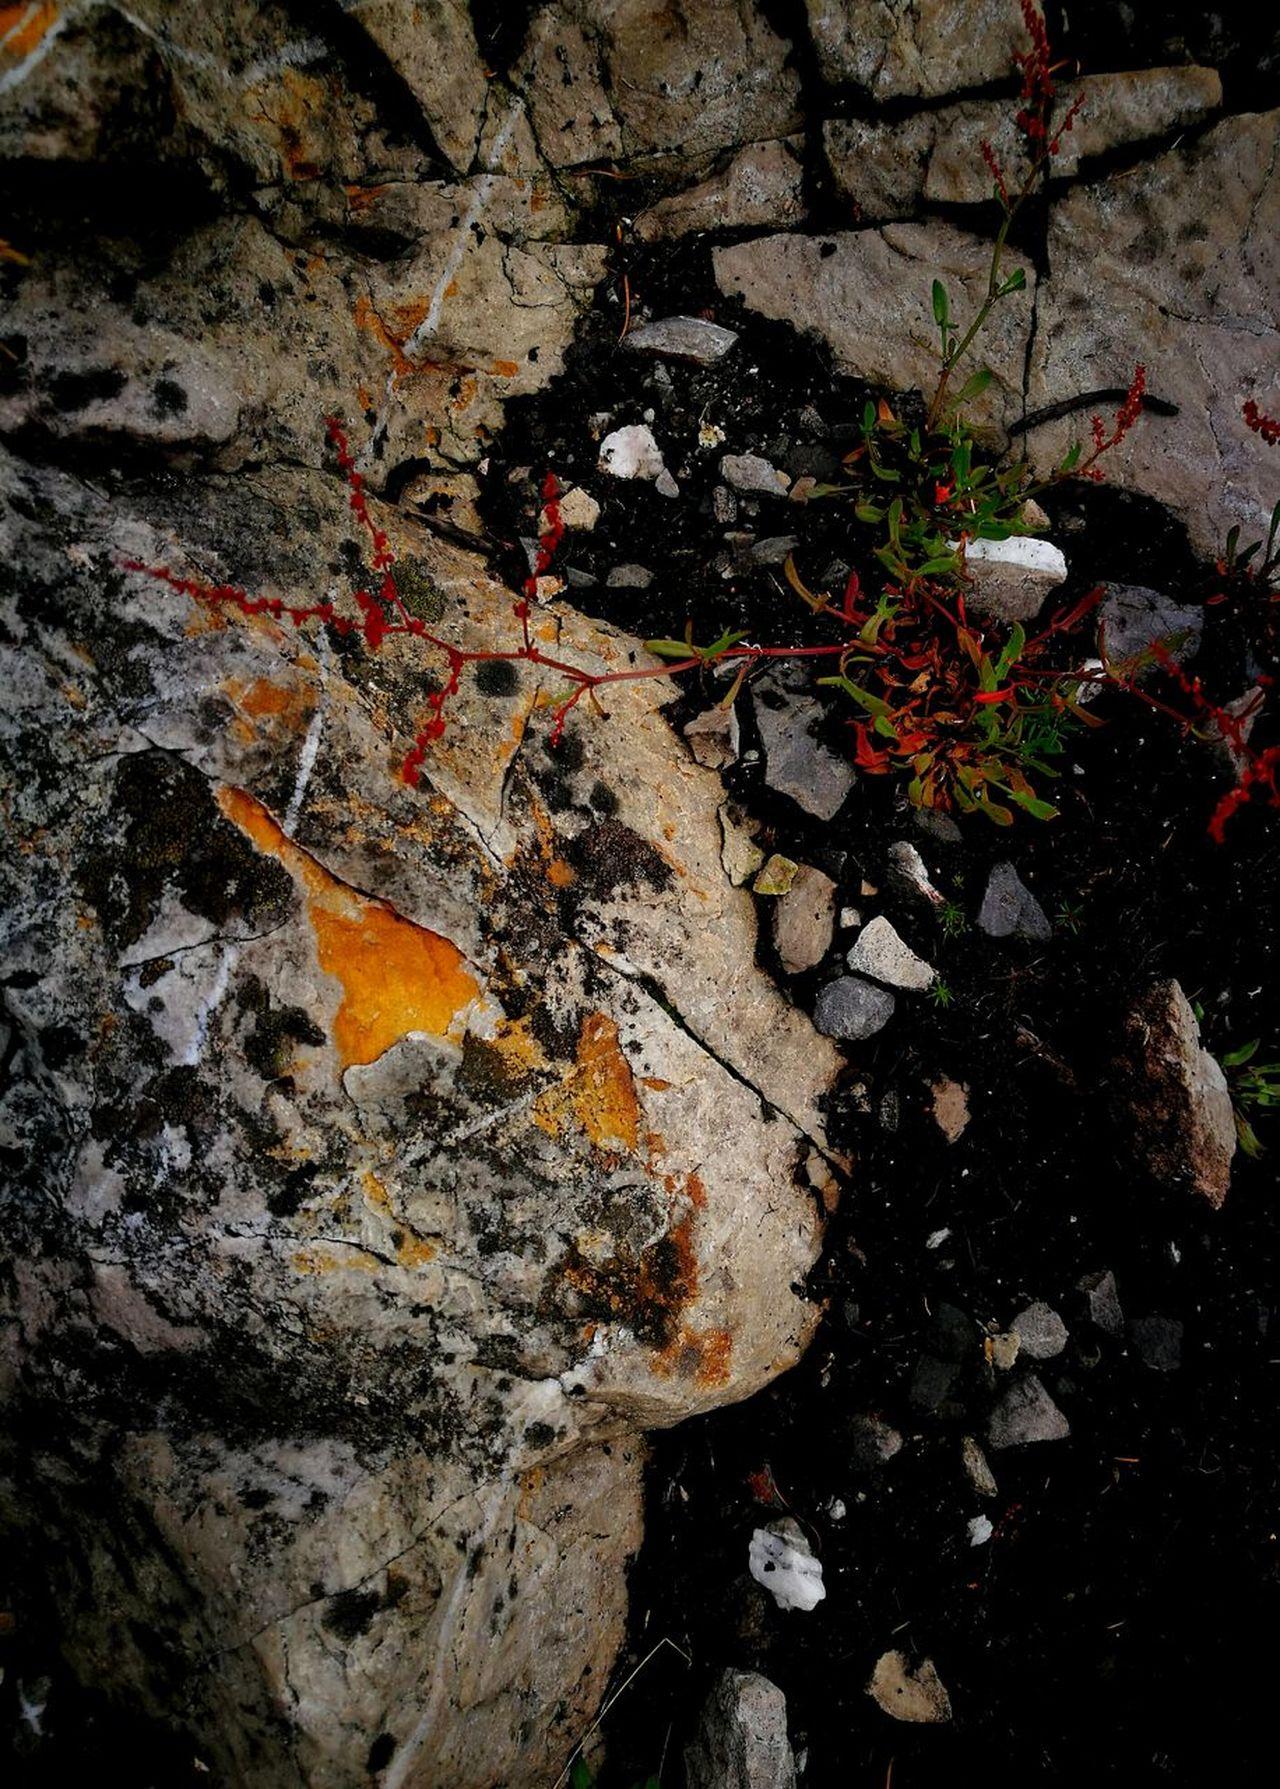 Rock Wild Flower Dark Earth Rich Colour Textures Outdoors Nature